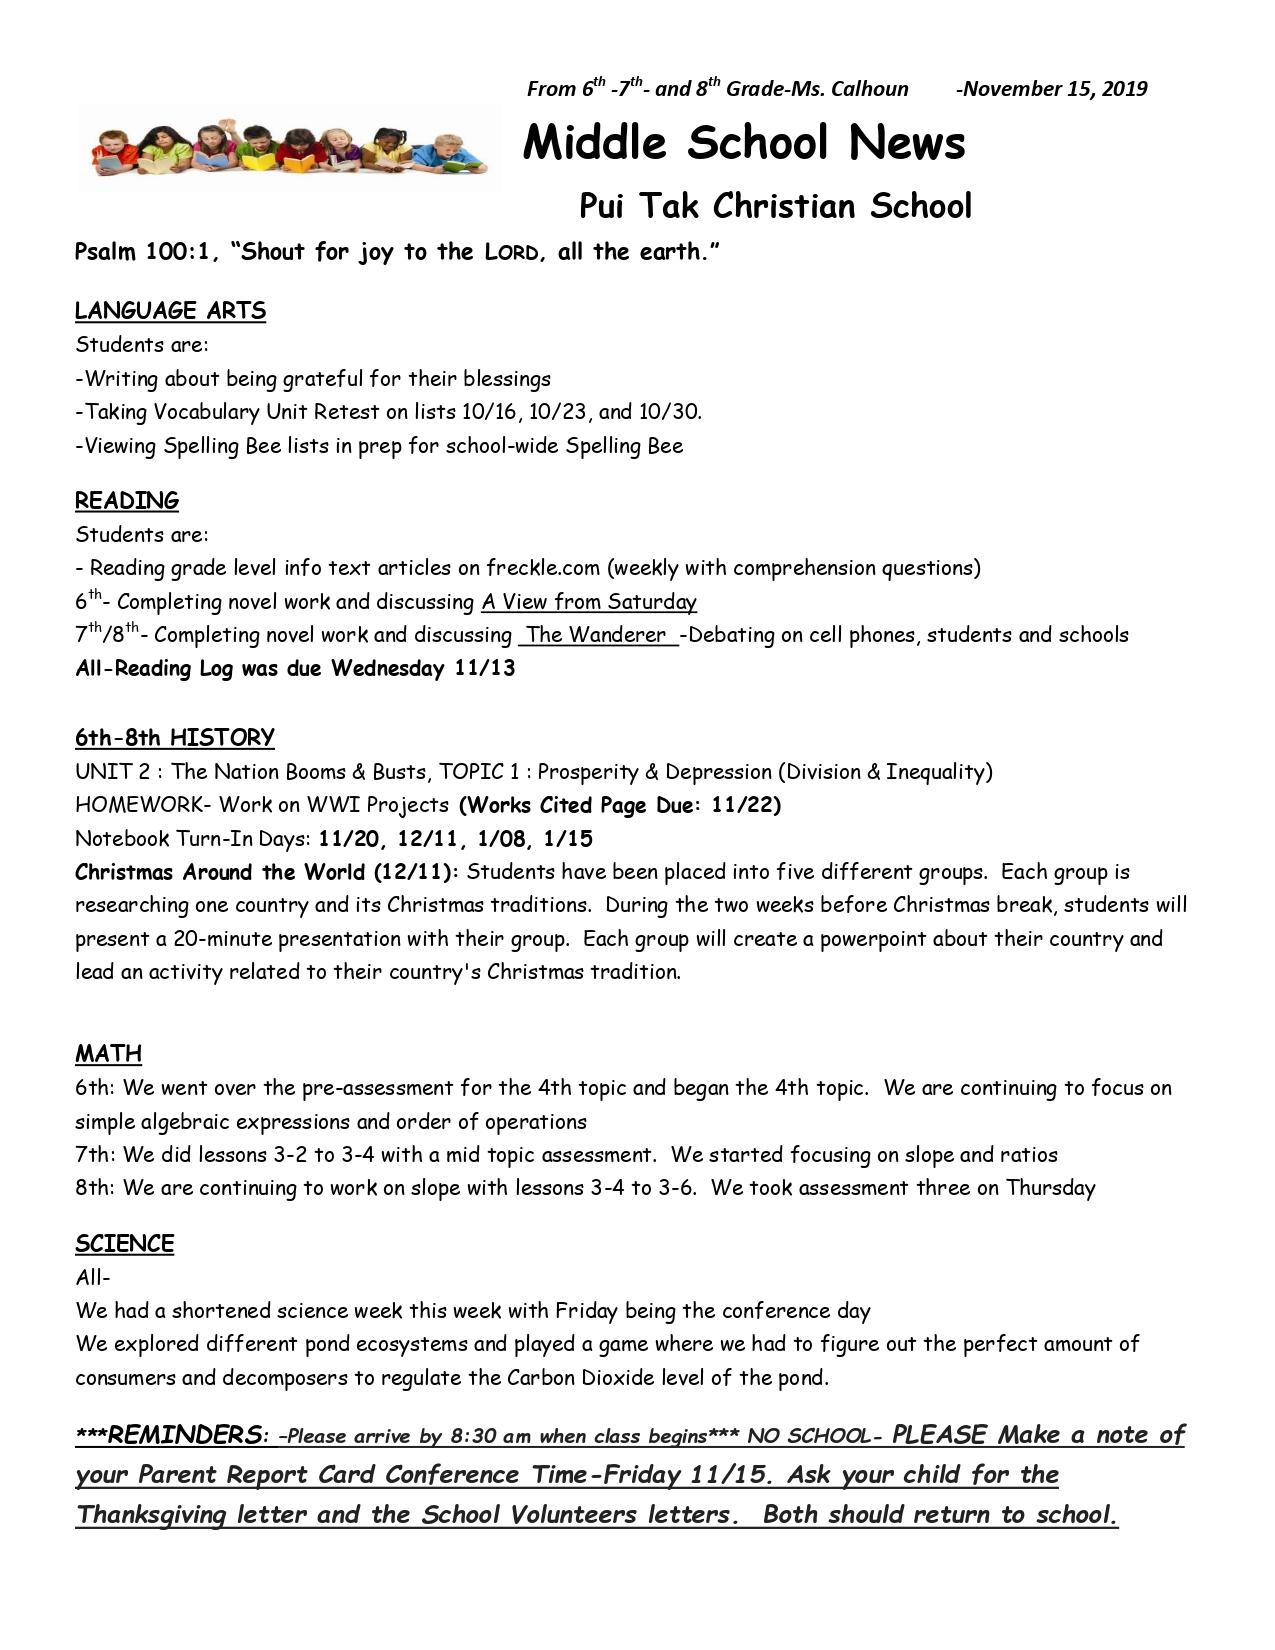 shaNewletter2019November3rdweek_page-000